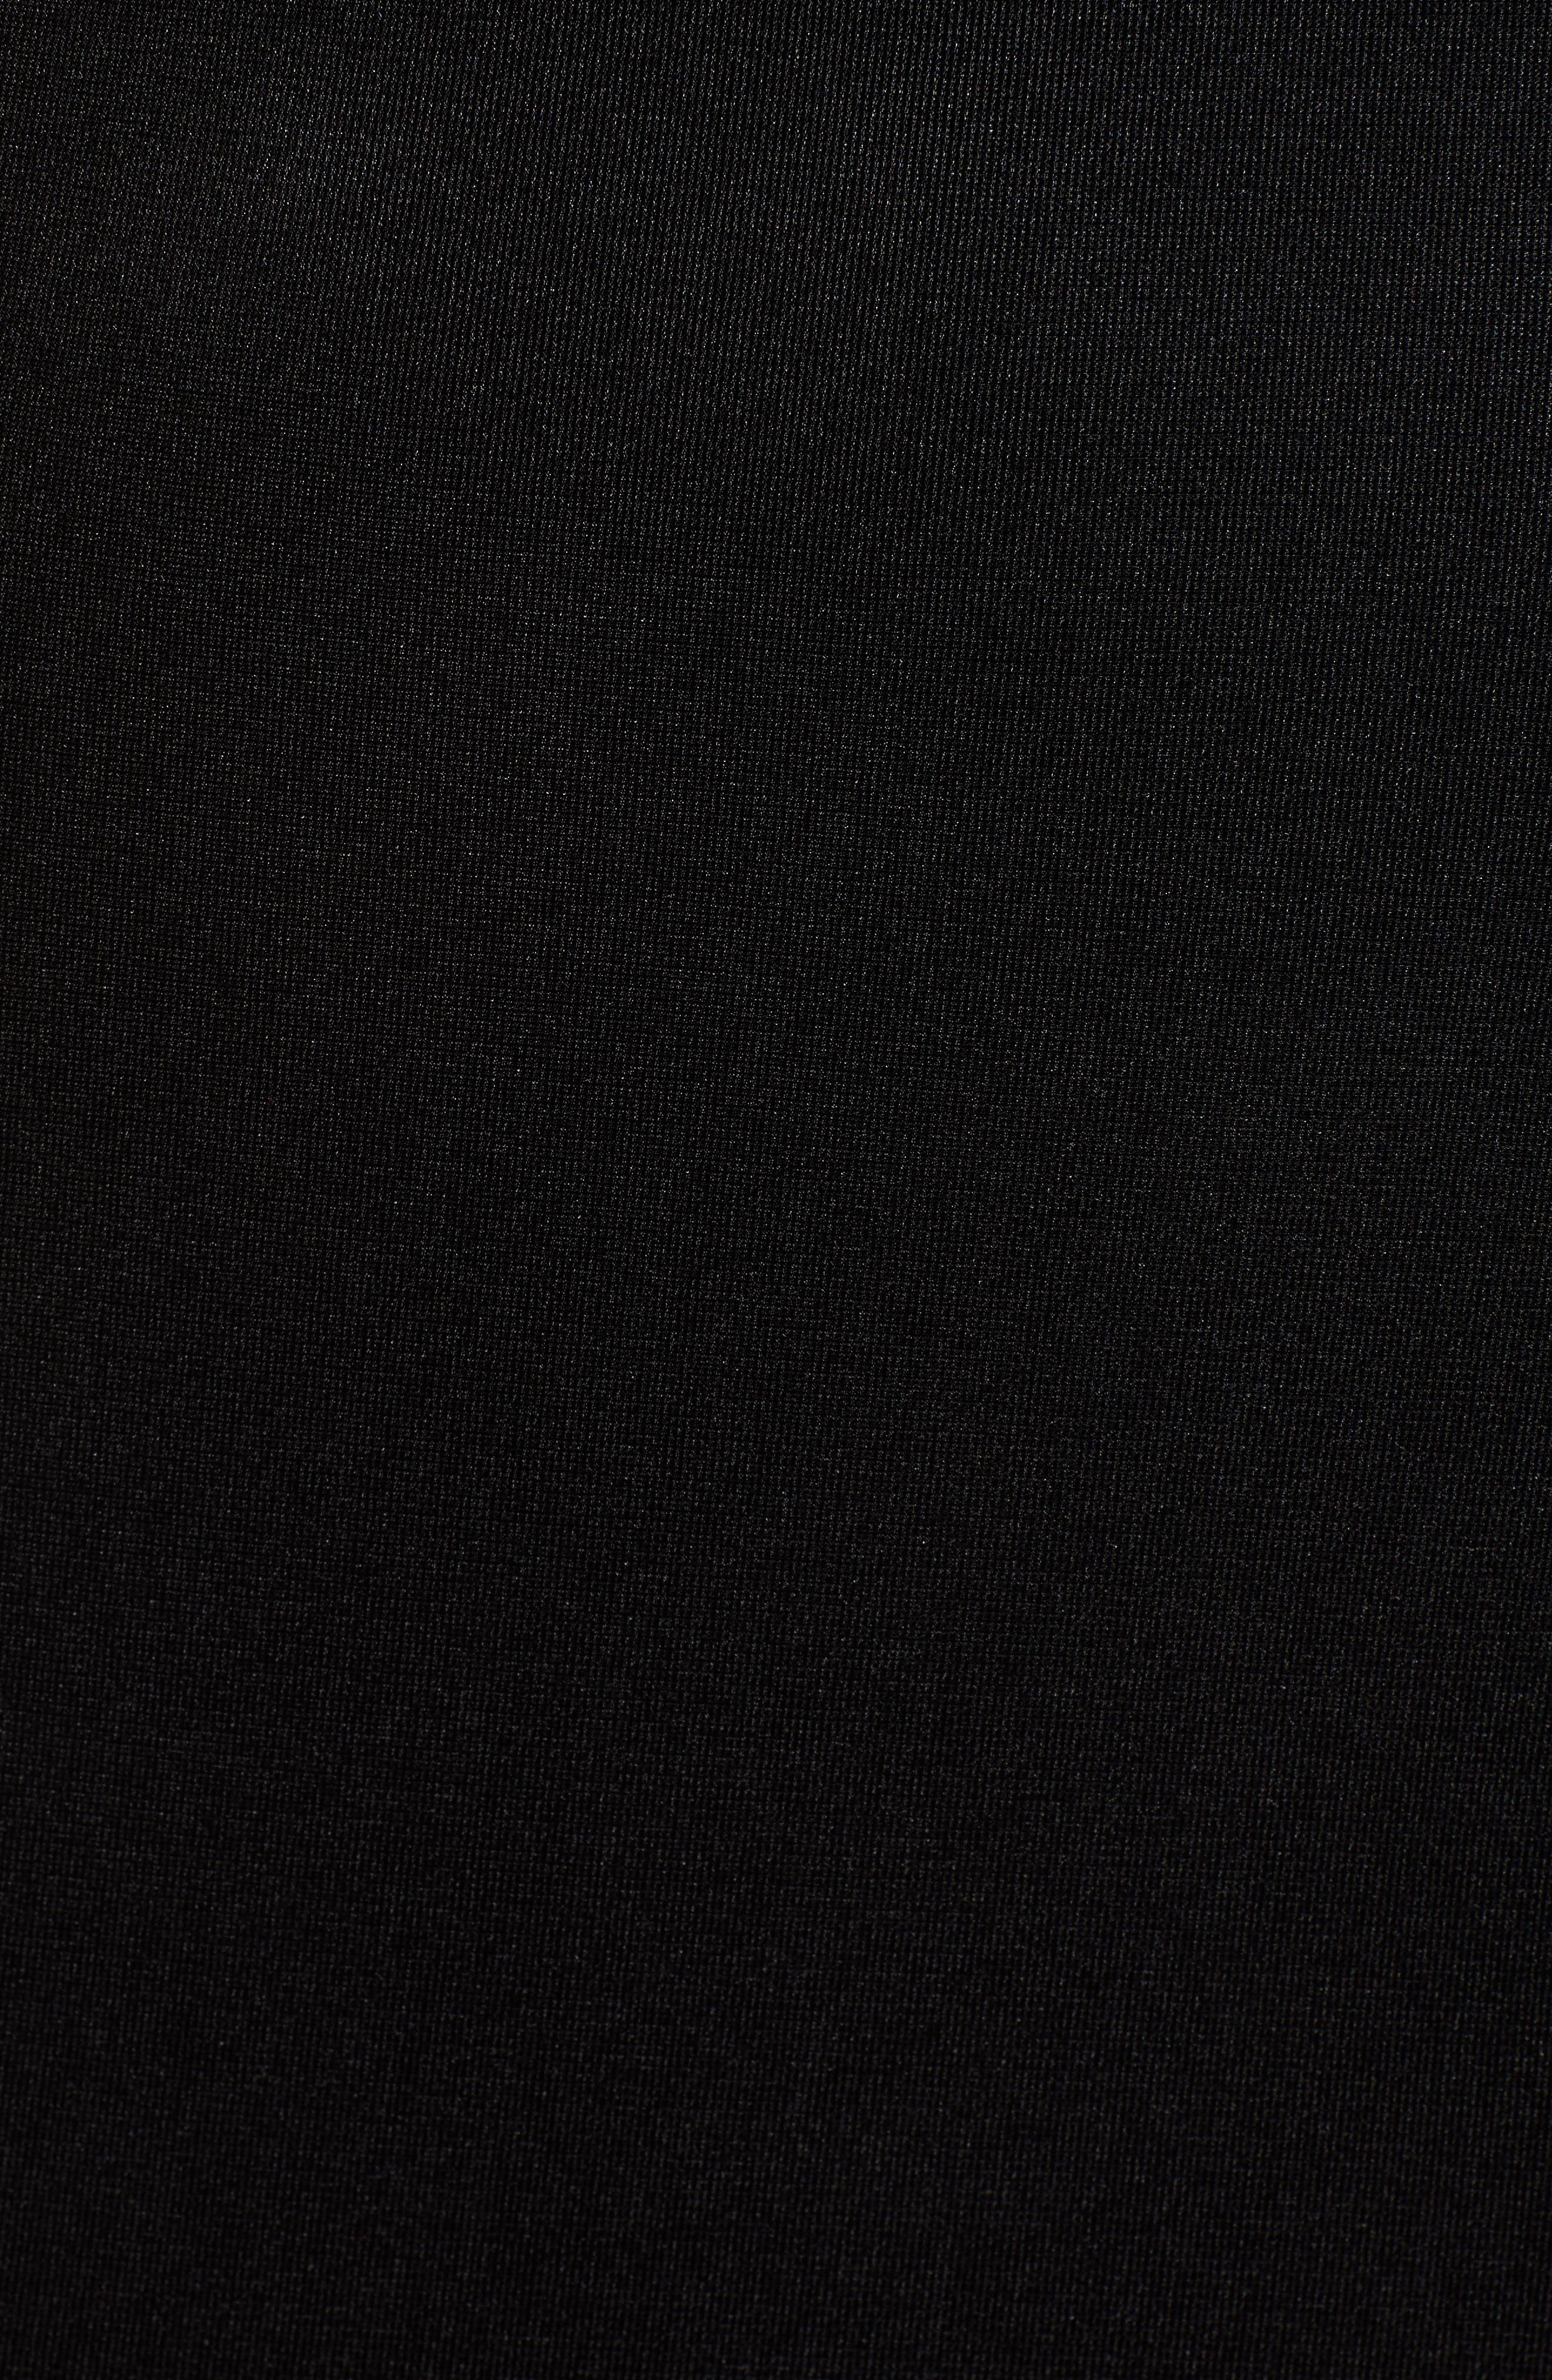 Side Illusion Sleeveless Sheath Dress,                             Alternate thumbnail 6, color,                             BLACK